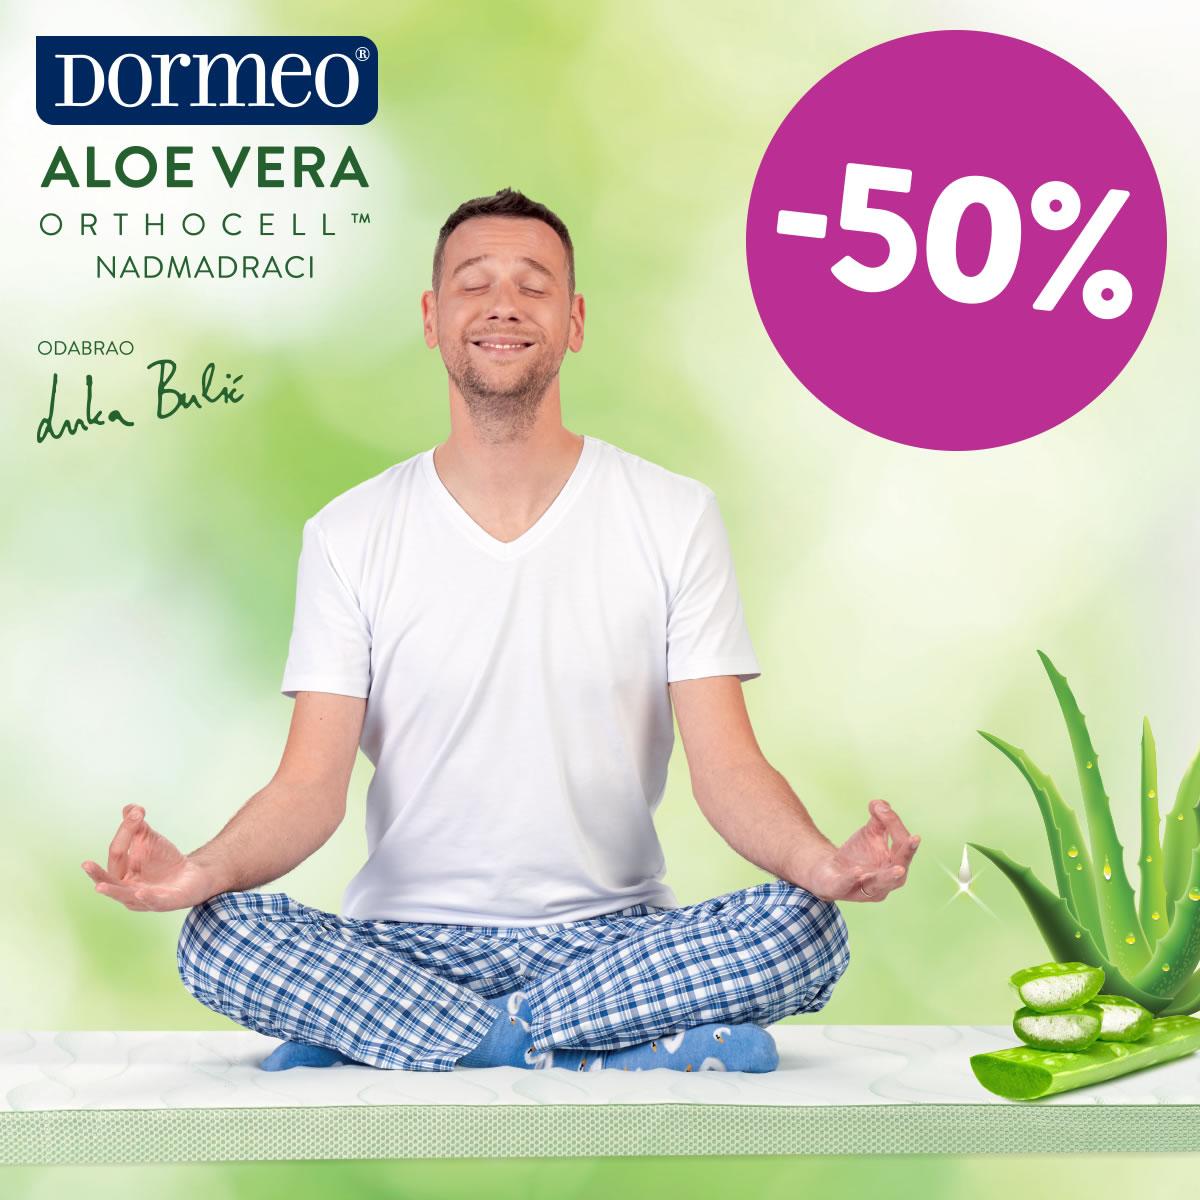 Dormeo Aloe Vera Orthocell nadmadraci na -50% popusta